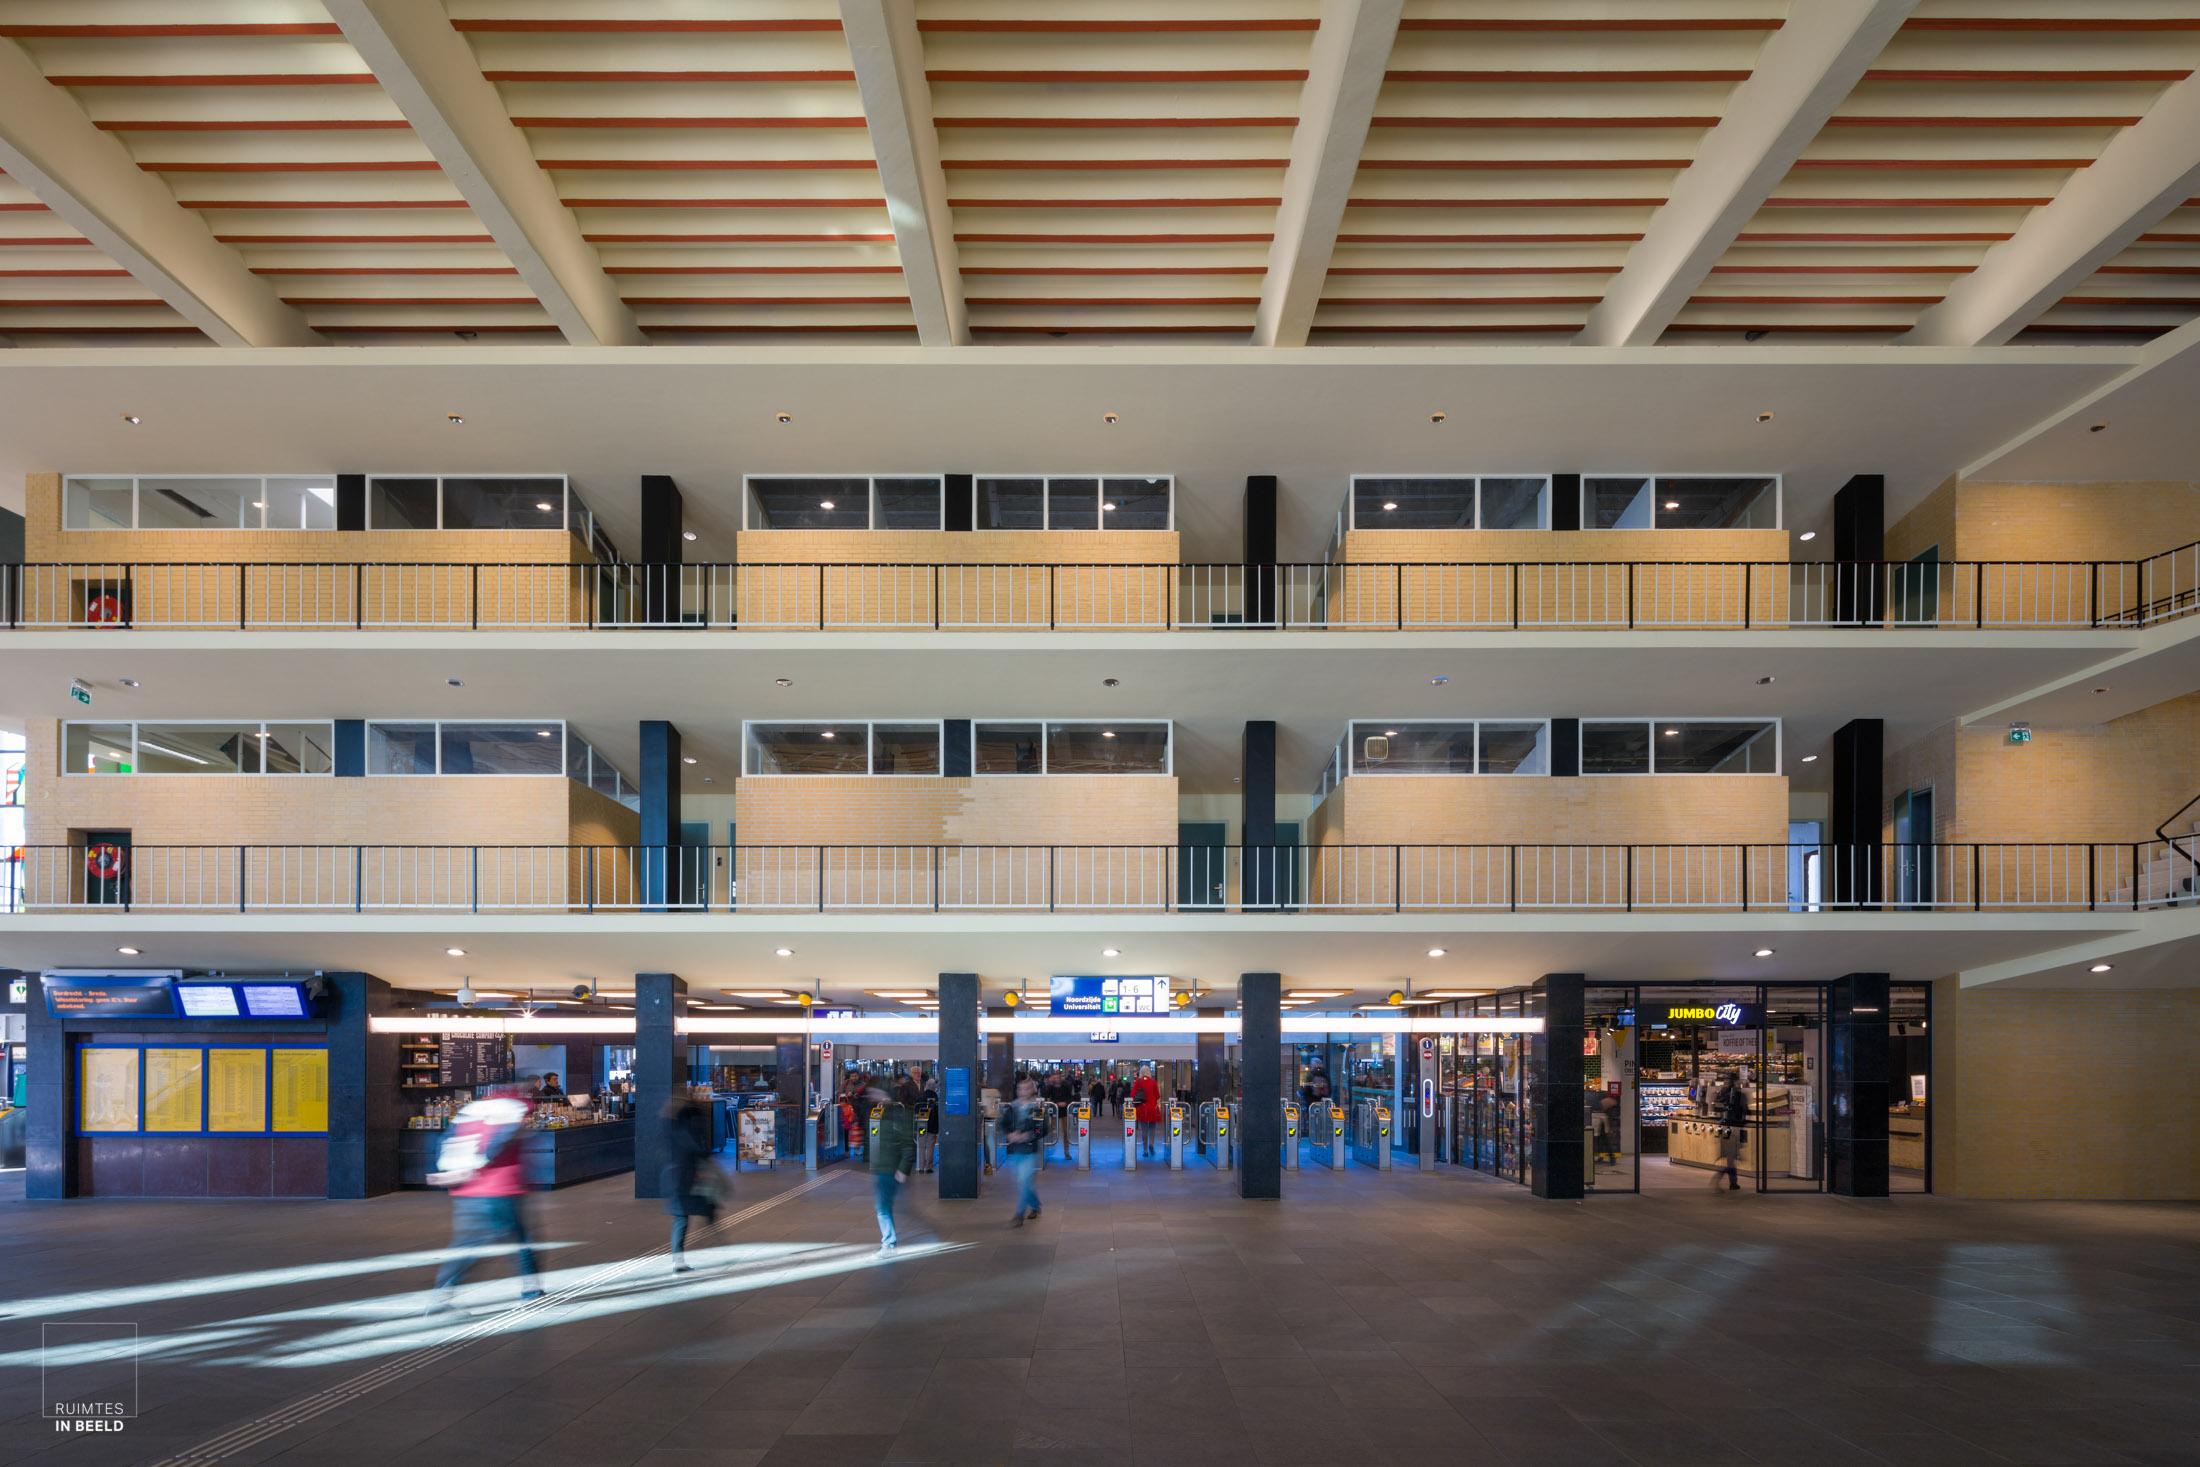 Station-Eindhoven-8.jpg